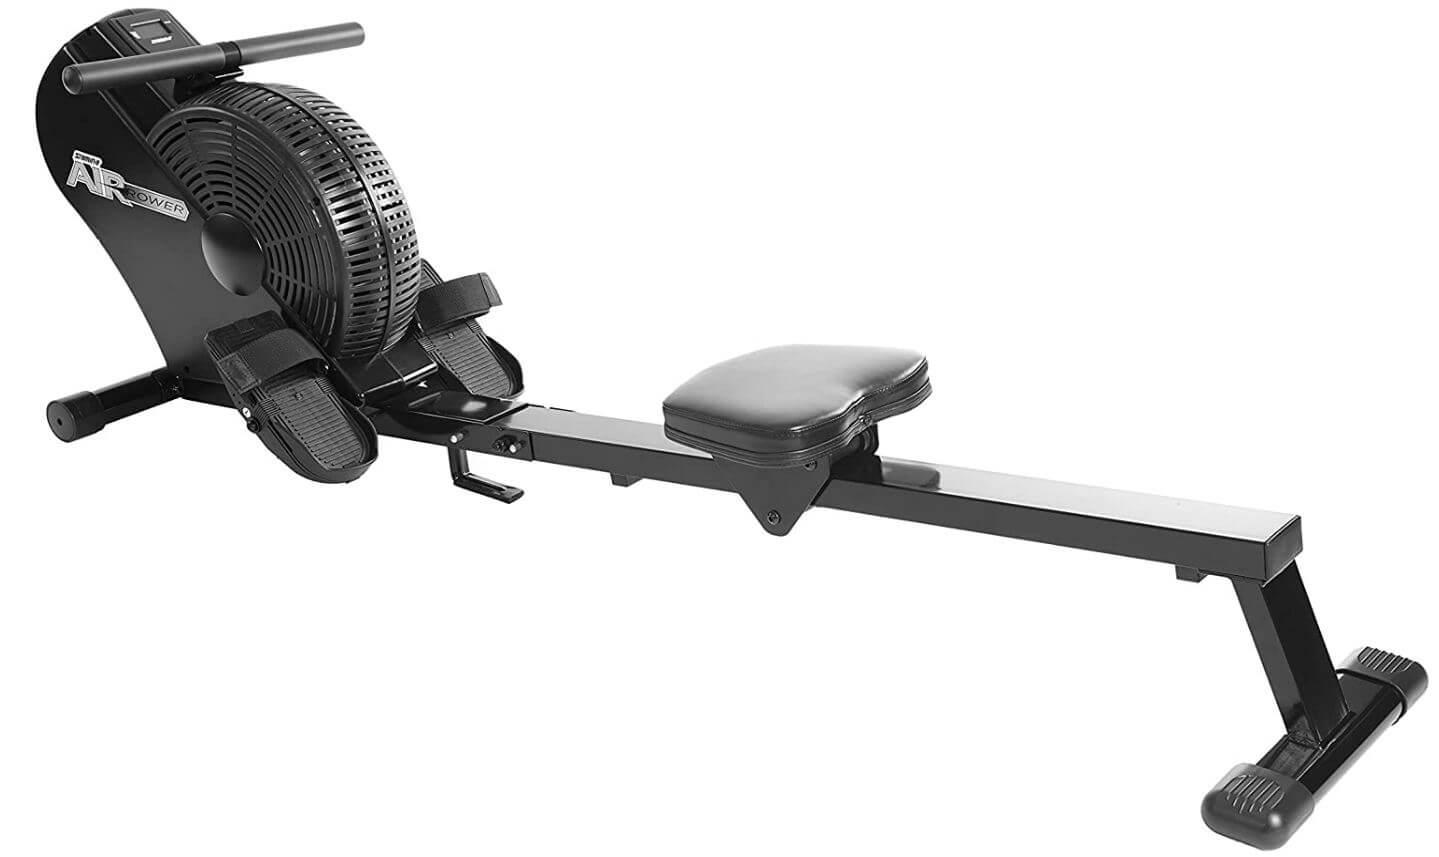 03) Stamina ATS Air Rower